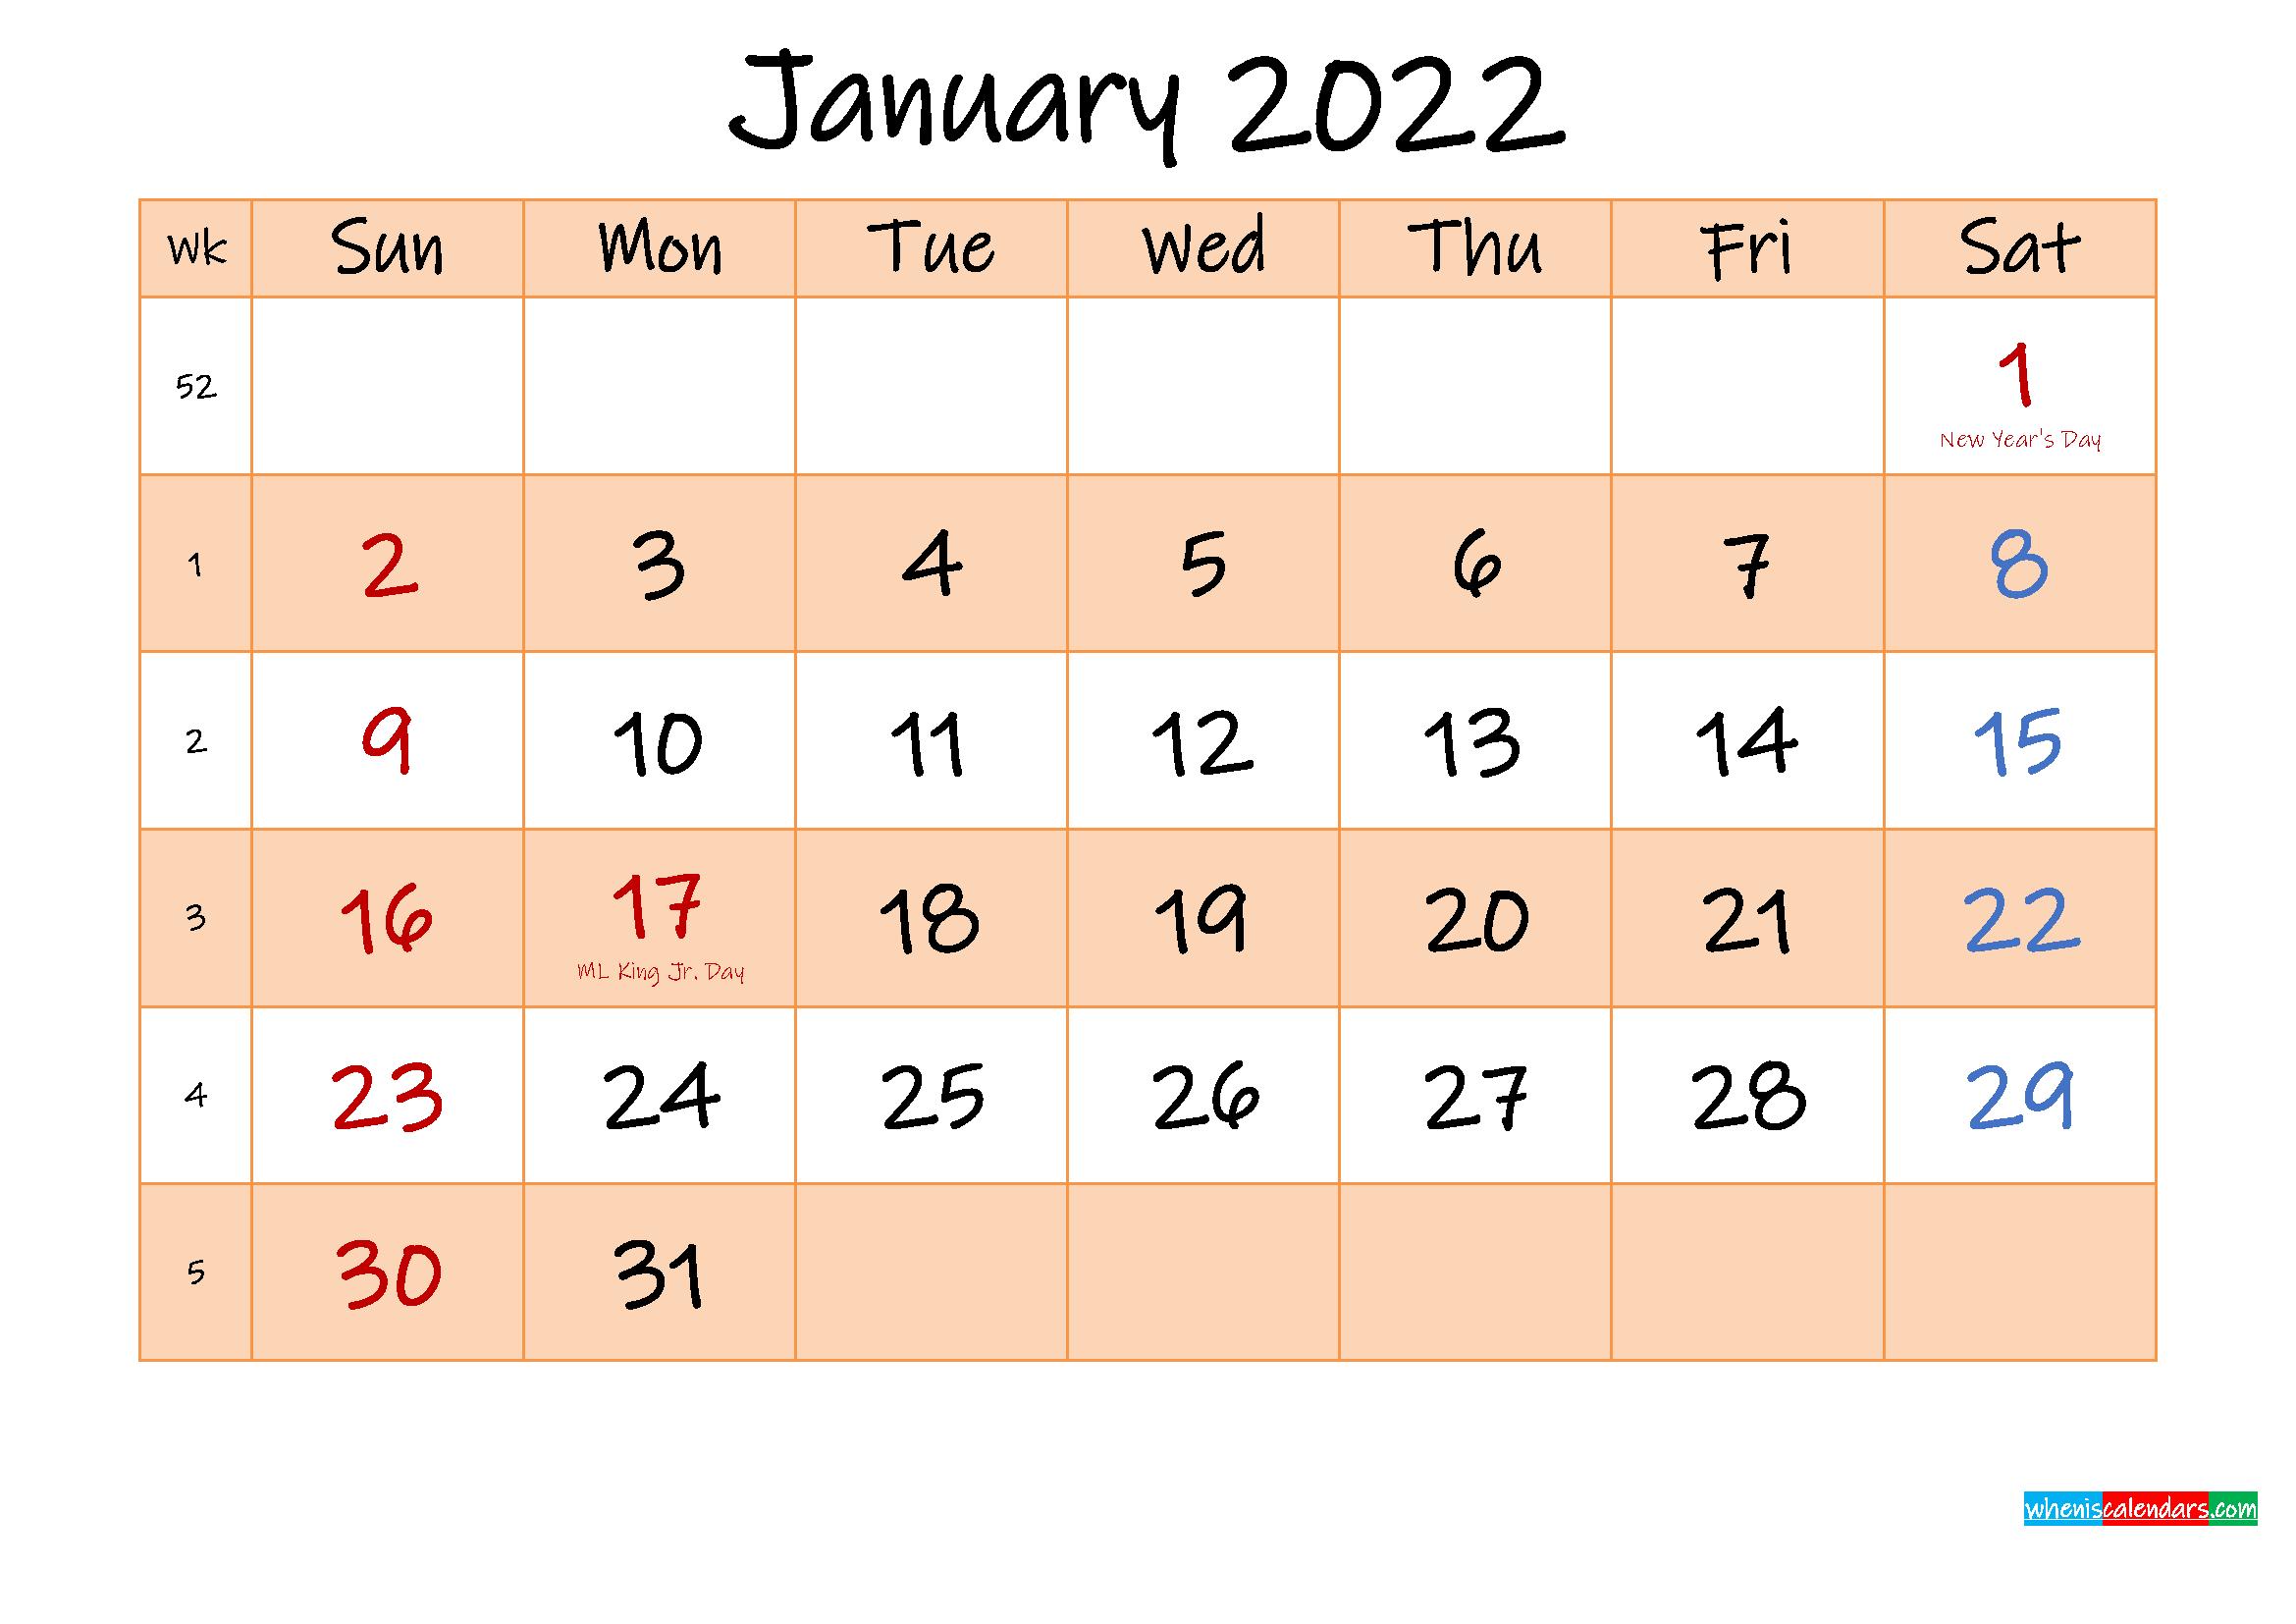 Editable January 2022 Calendar - Template No.ink22M481 regarding January 2022 Calendar Printable Free Graphics